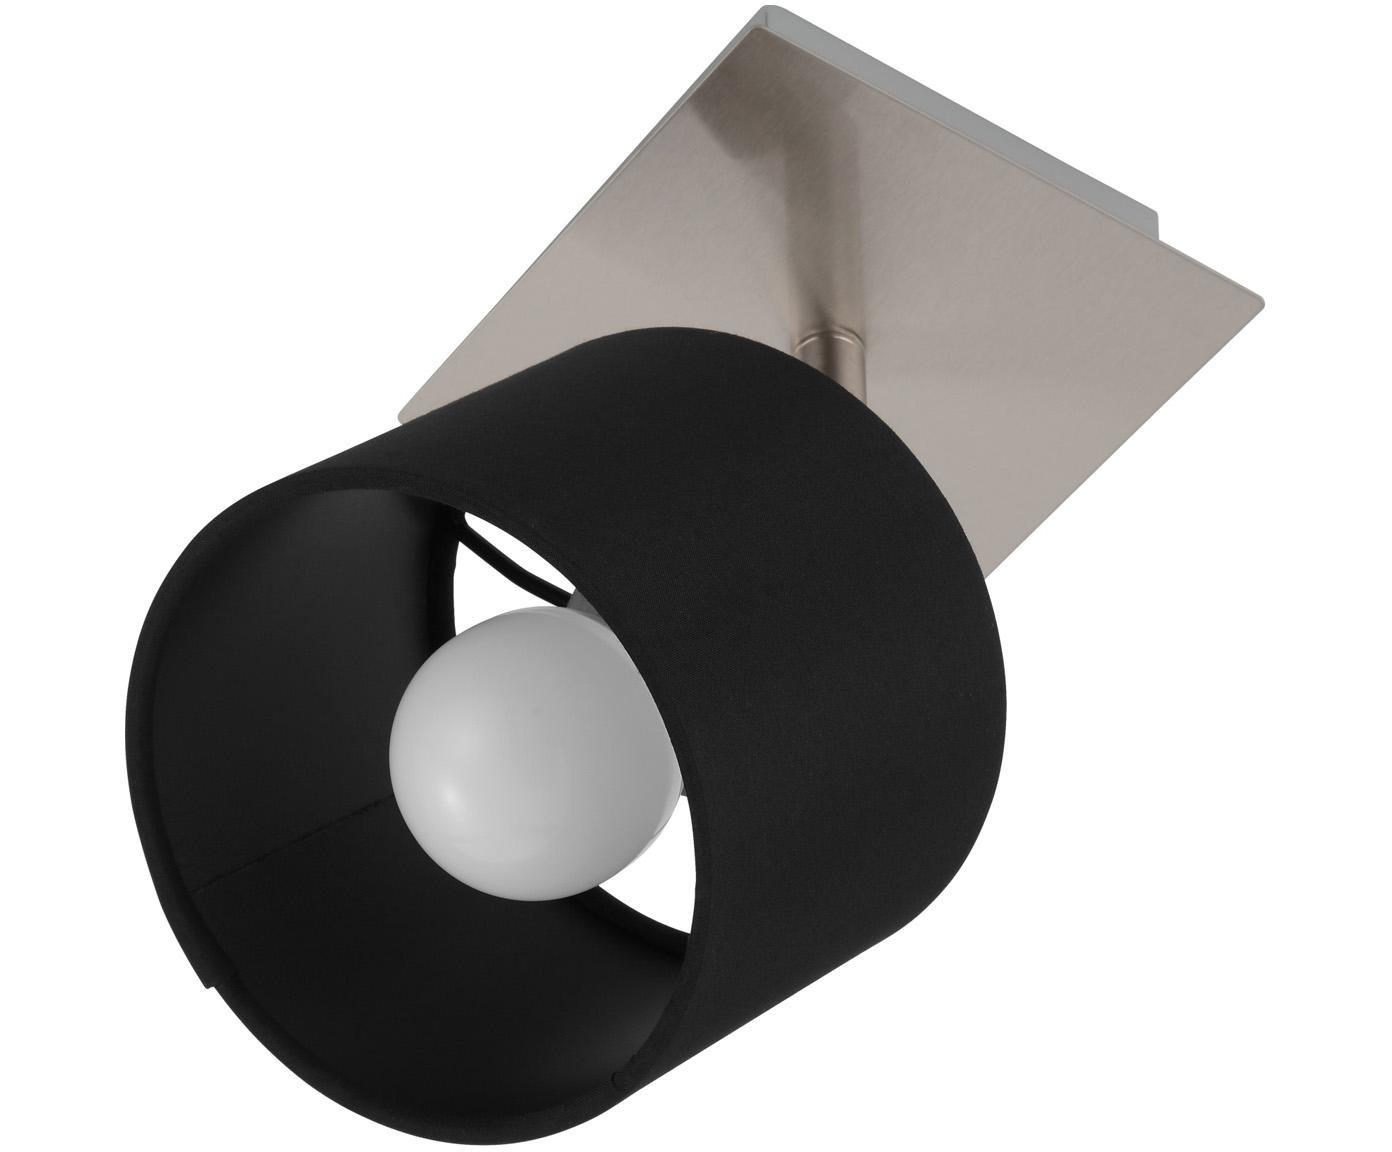 Plafoniera Casper, Baldacchino: metallo nichelato, Paralume: tessile, Argentato, nero, Larg. 11 x Alt. 11 cm